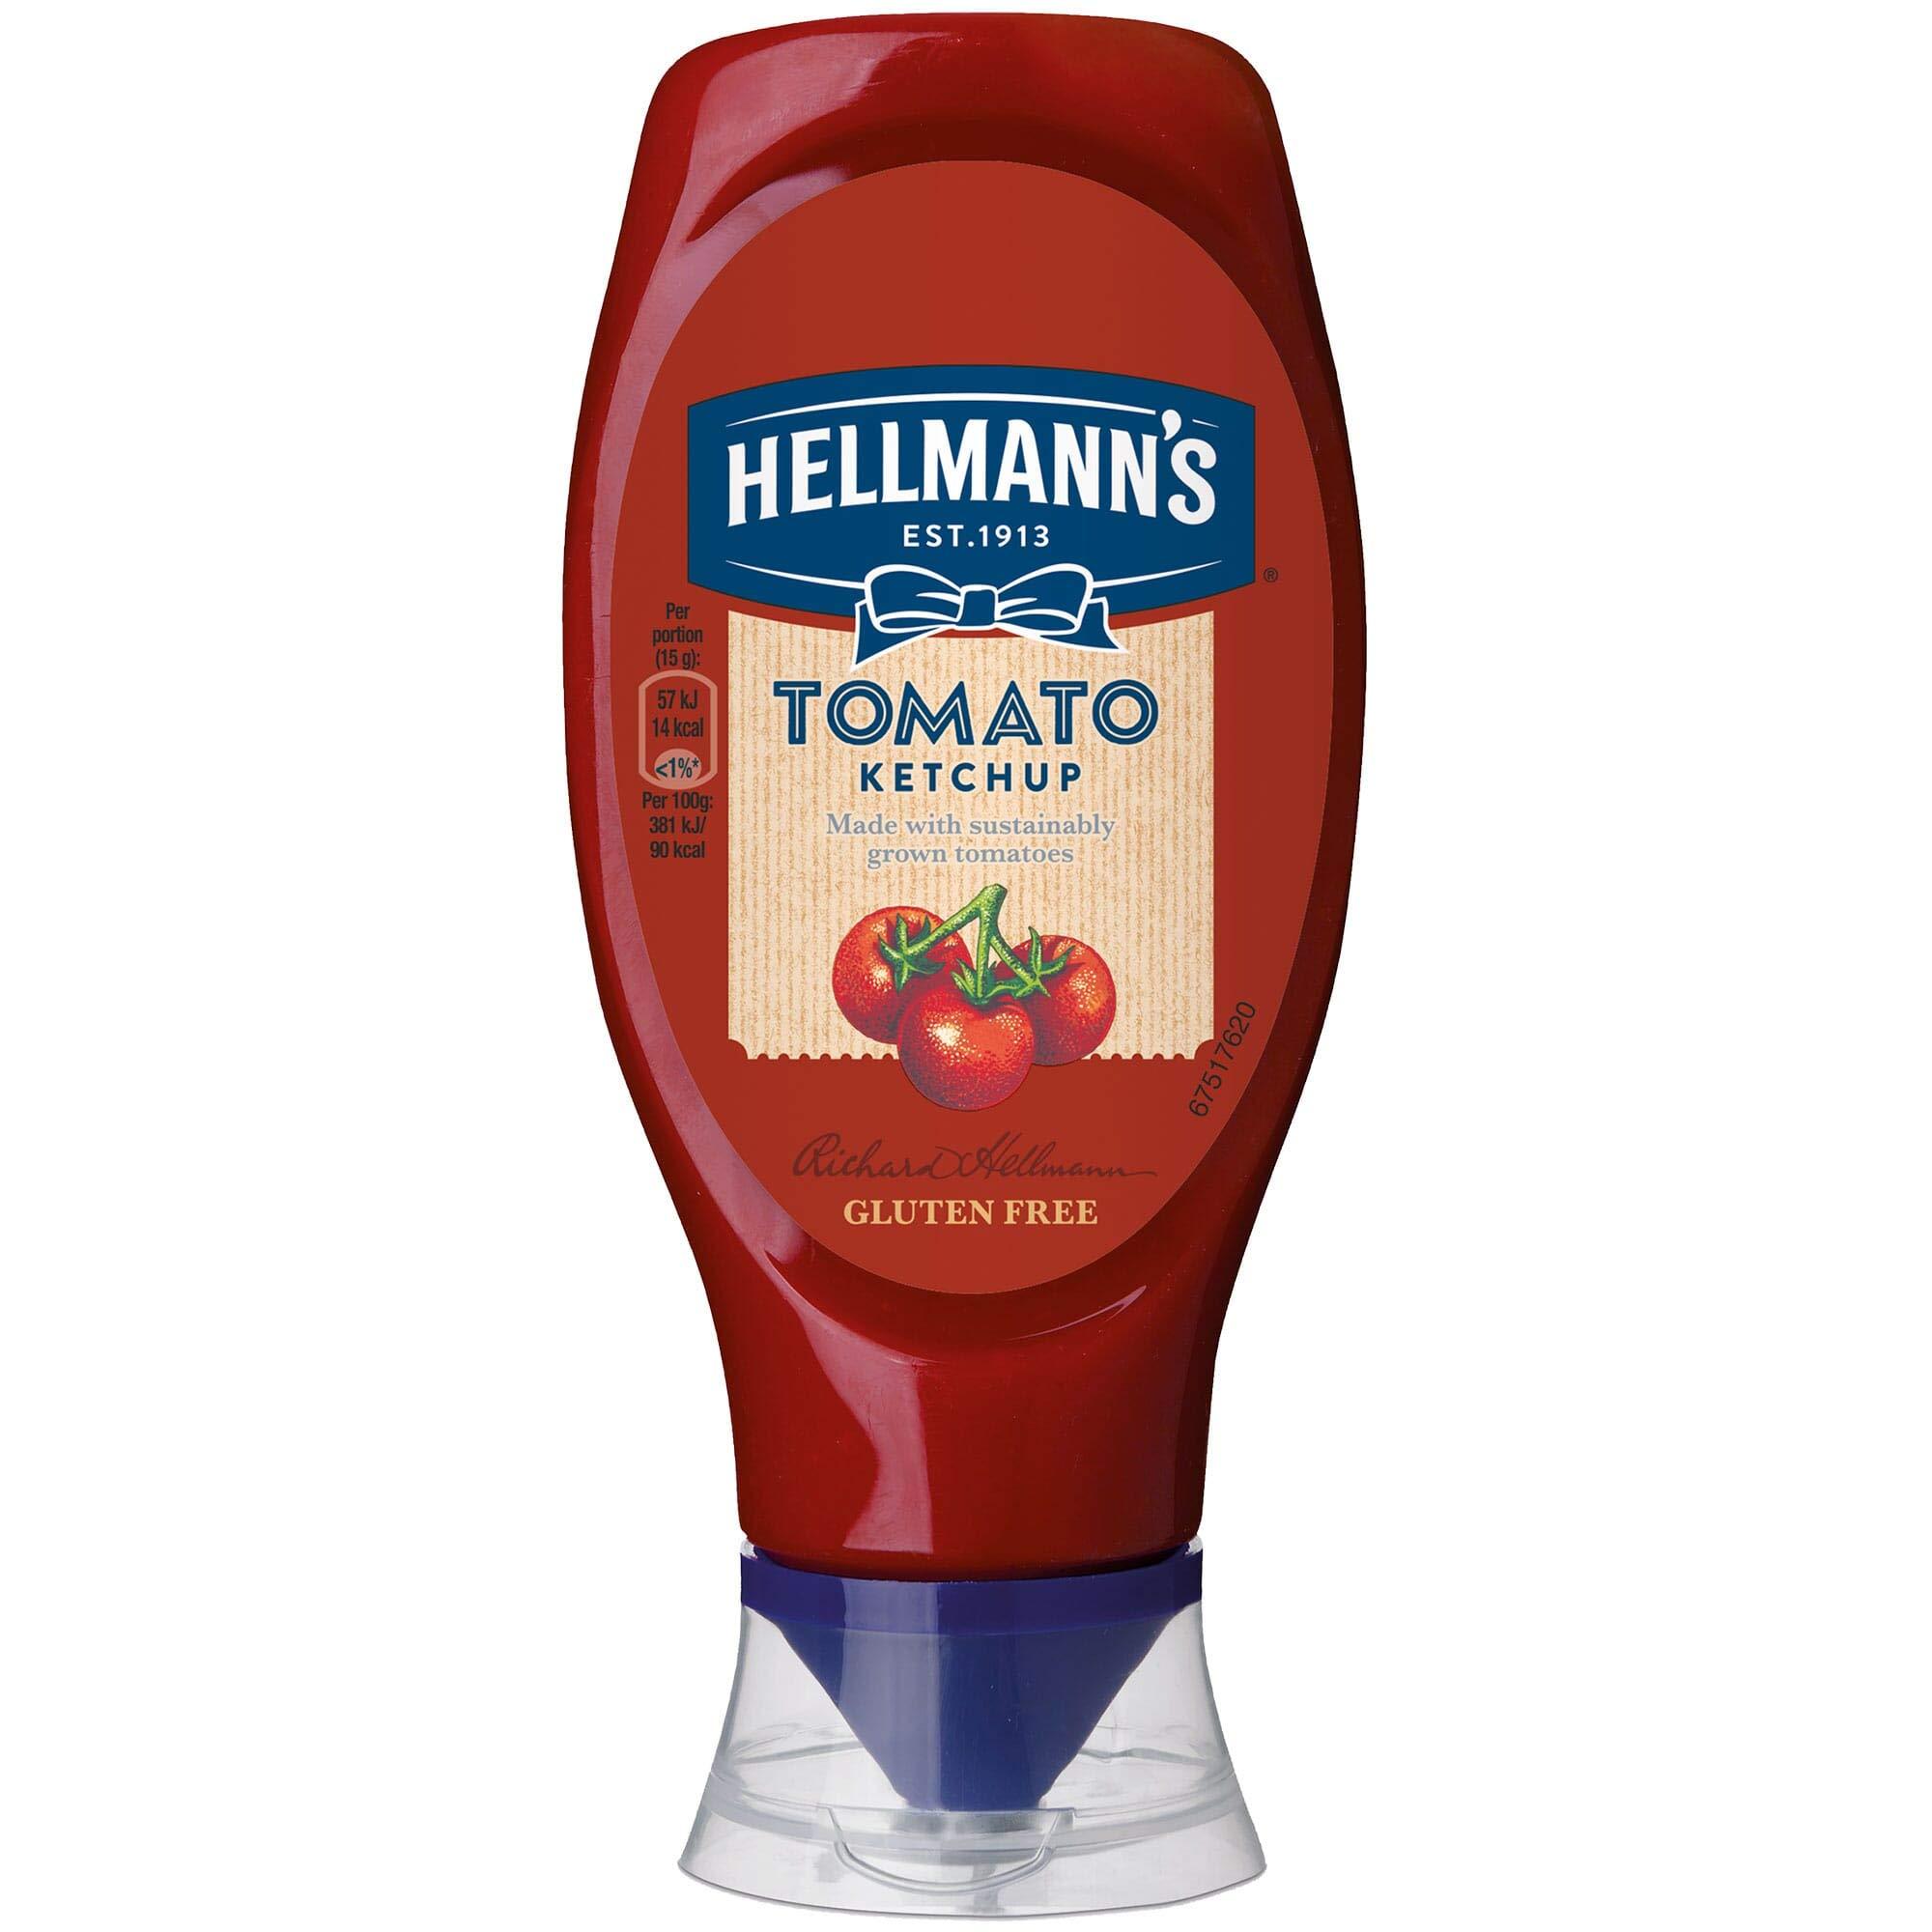 Hellmann's Tomato Ketchup - 8x430ml